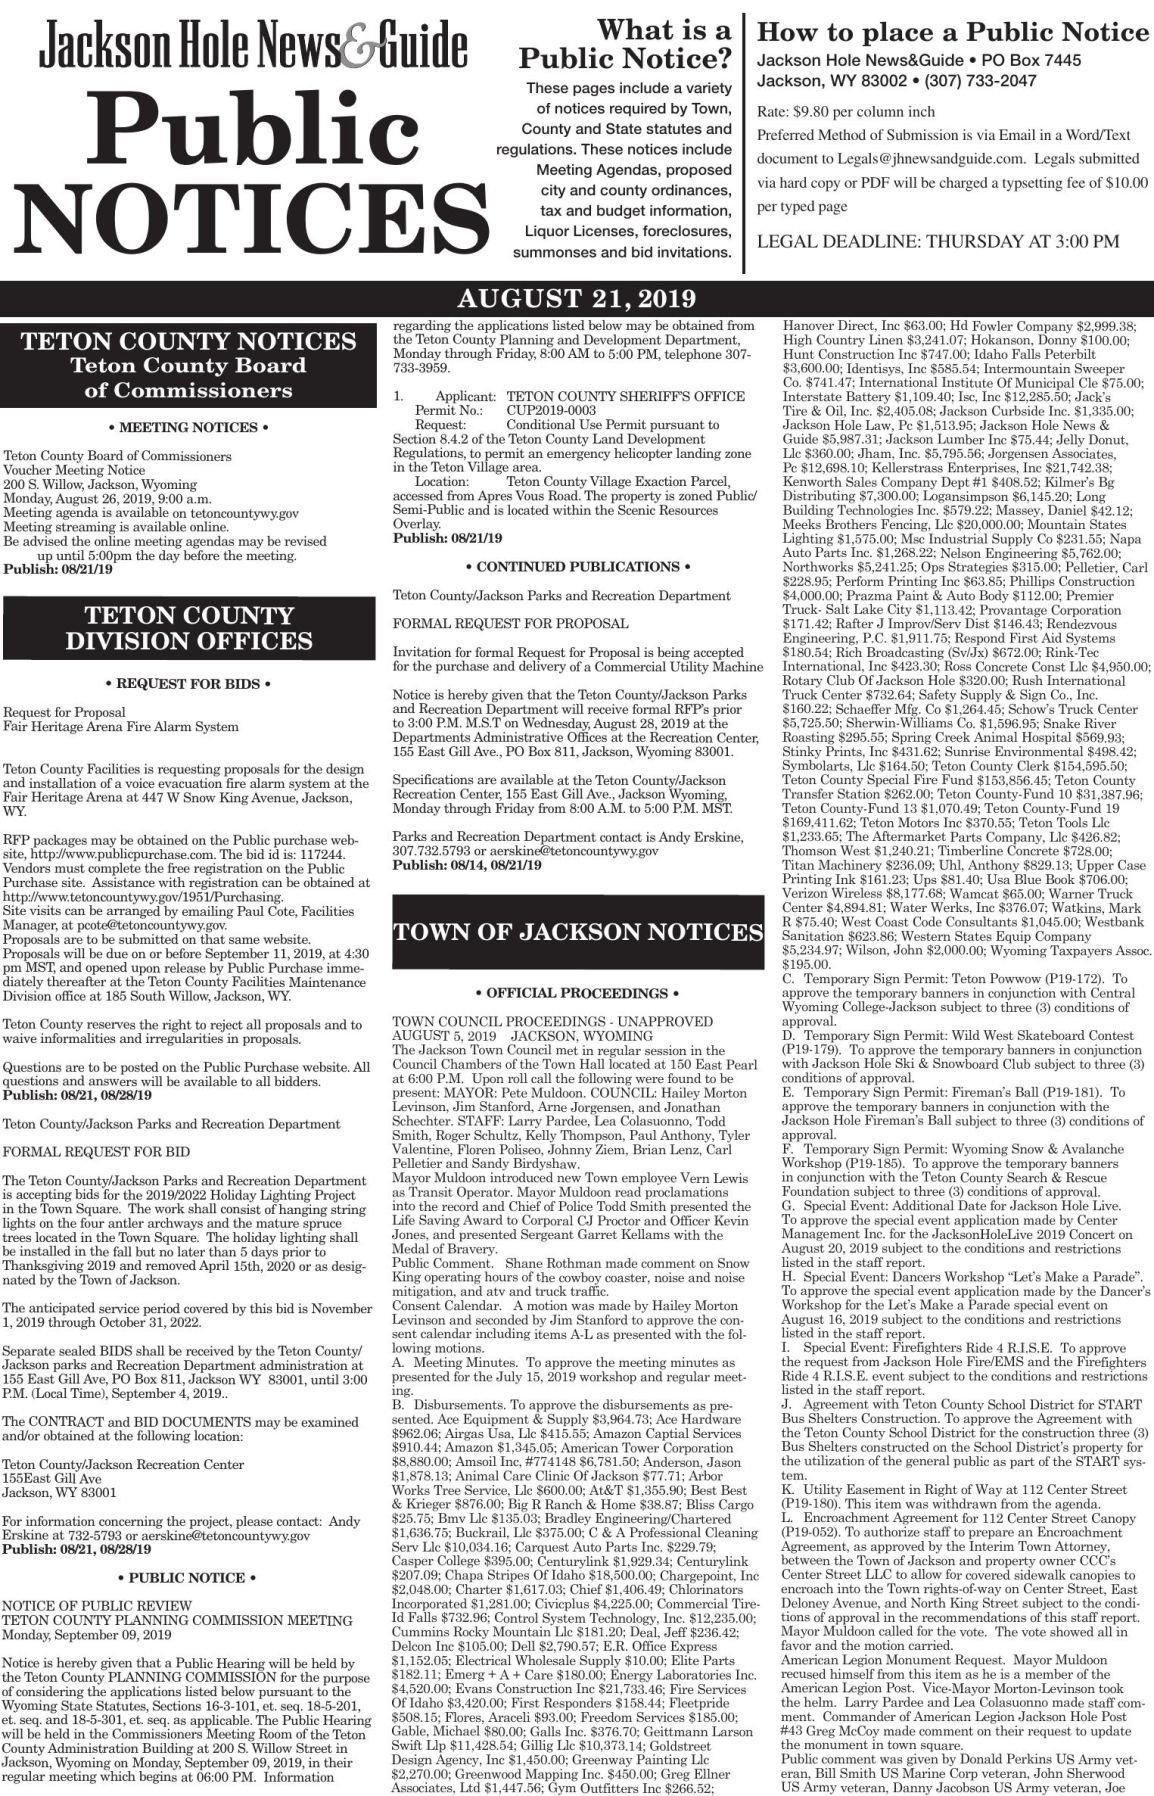 Public Notices, August 21, 2019